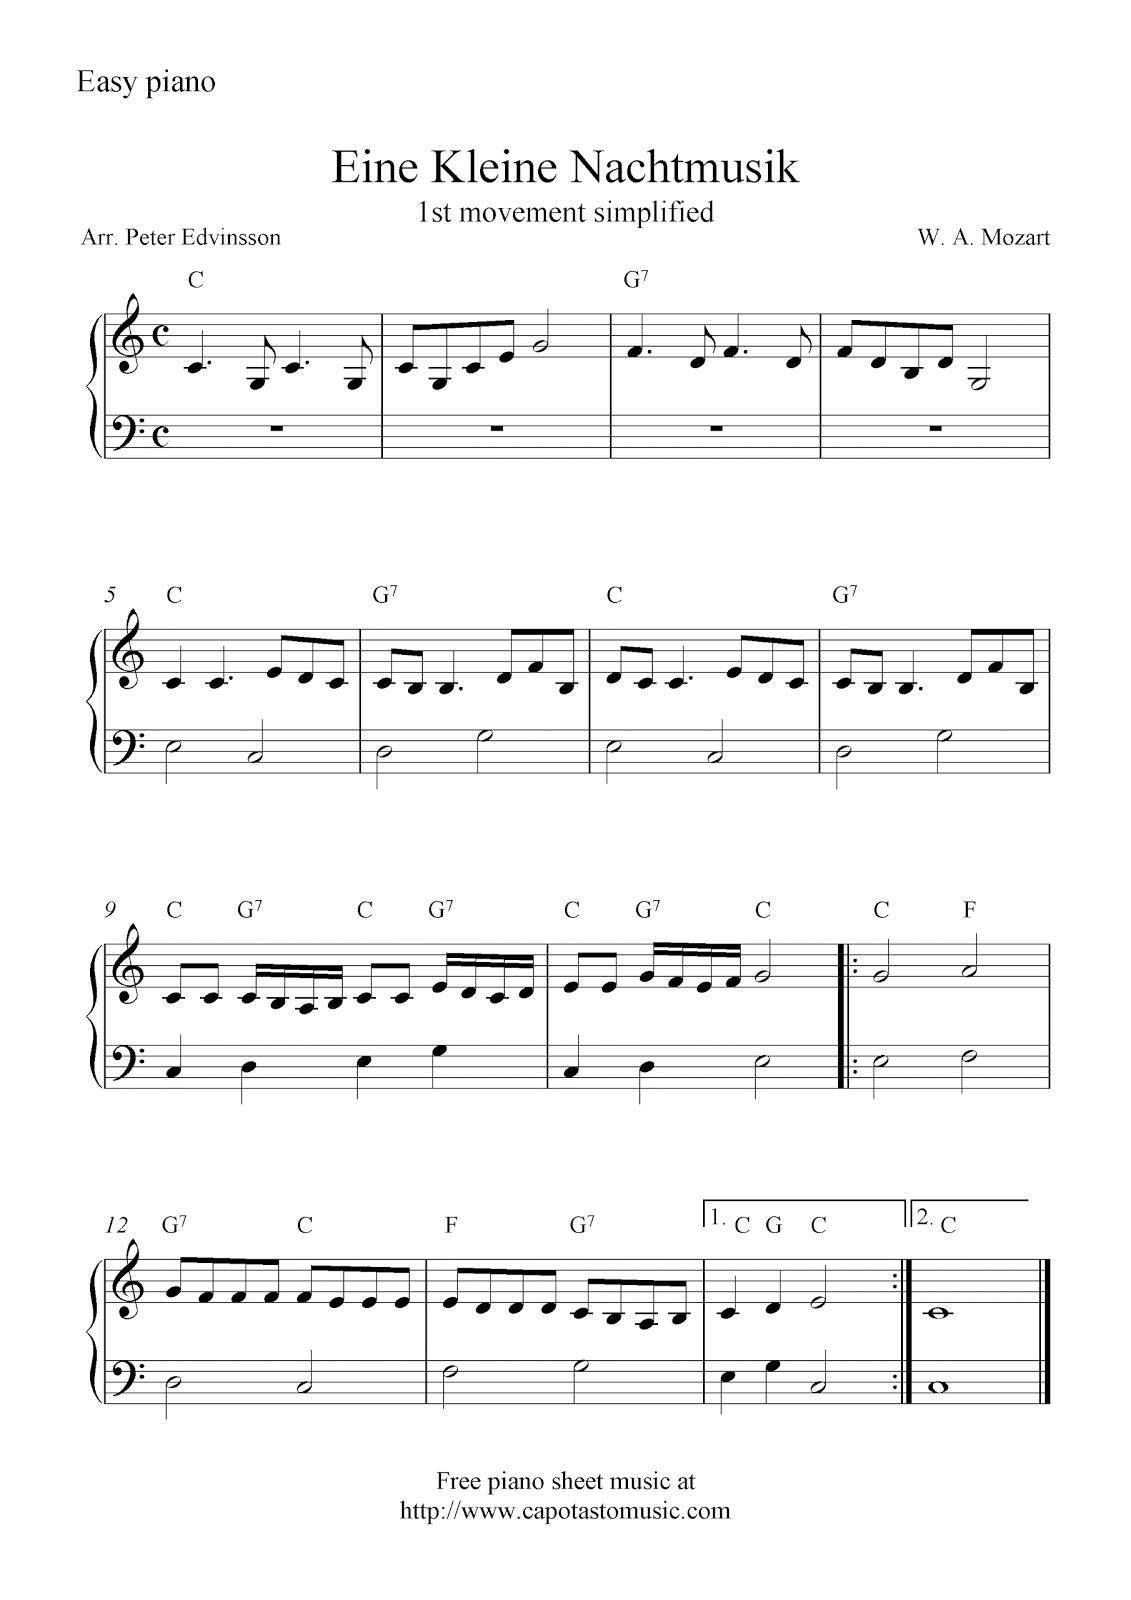 free sheet music scores eine kleine nachtmusik free easy piano sheet music m zik piano. Black Bedroom Furniture Sets. Home Design Ideas